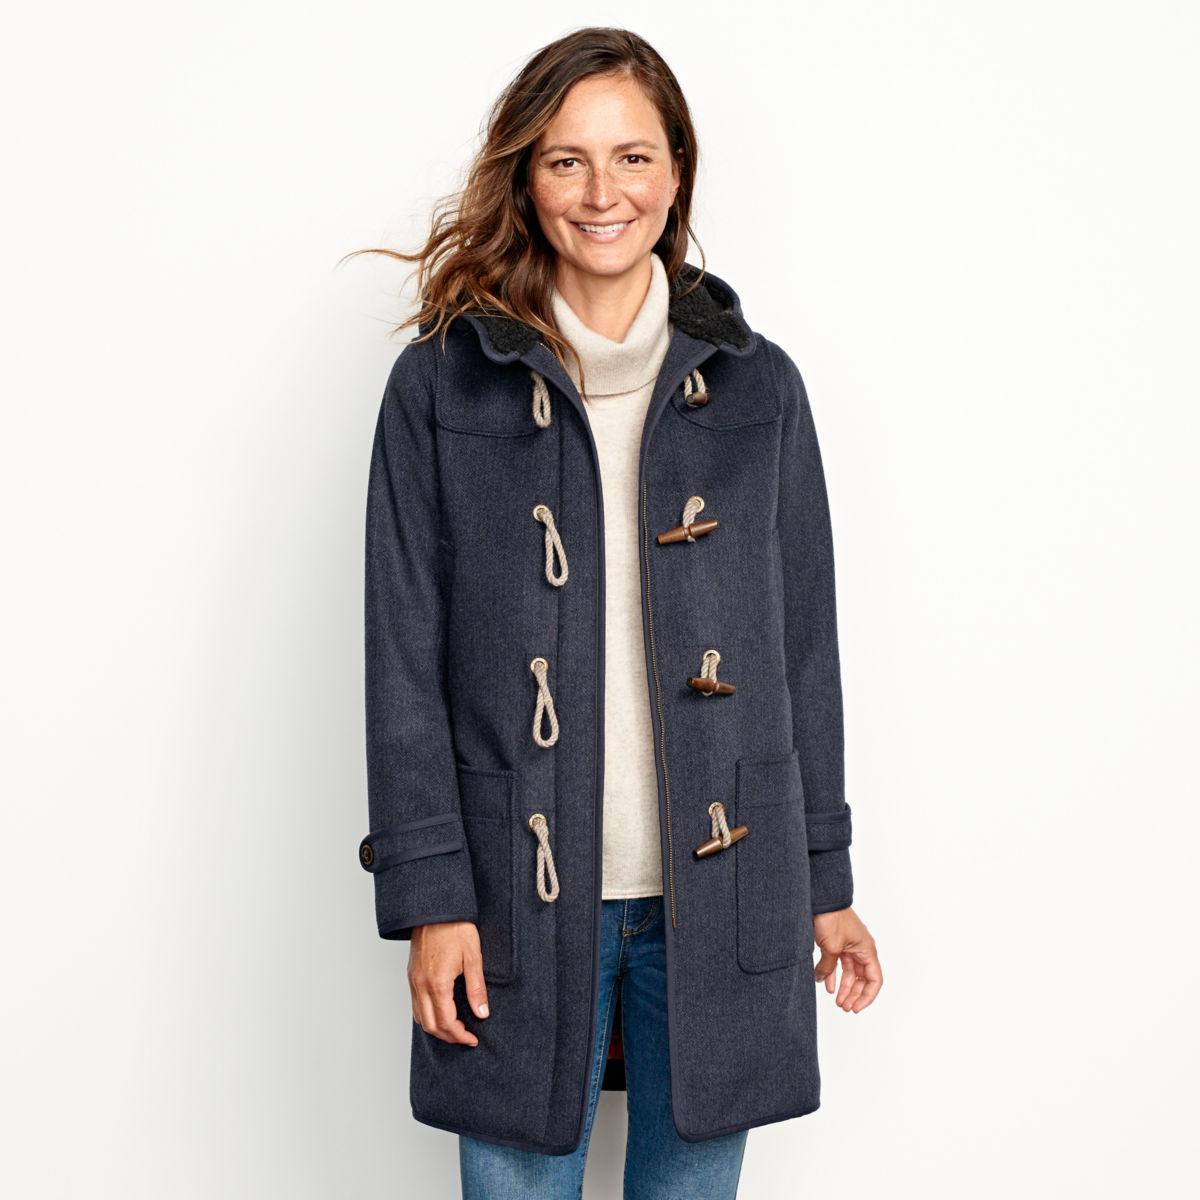 Orvis Storm Wool Duffle Coat - image number 0